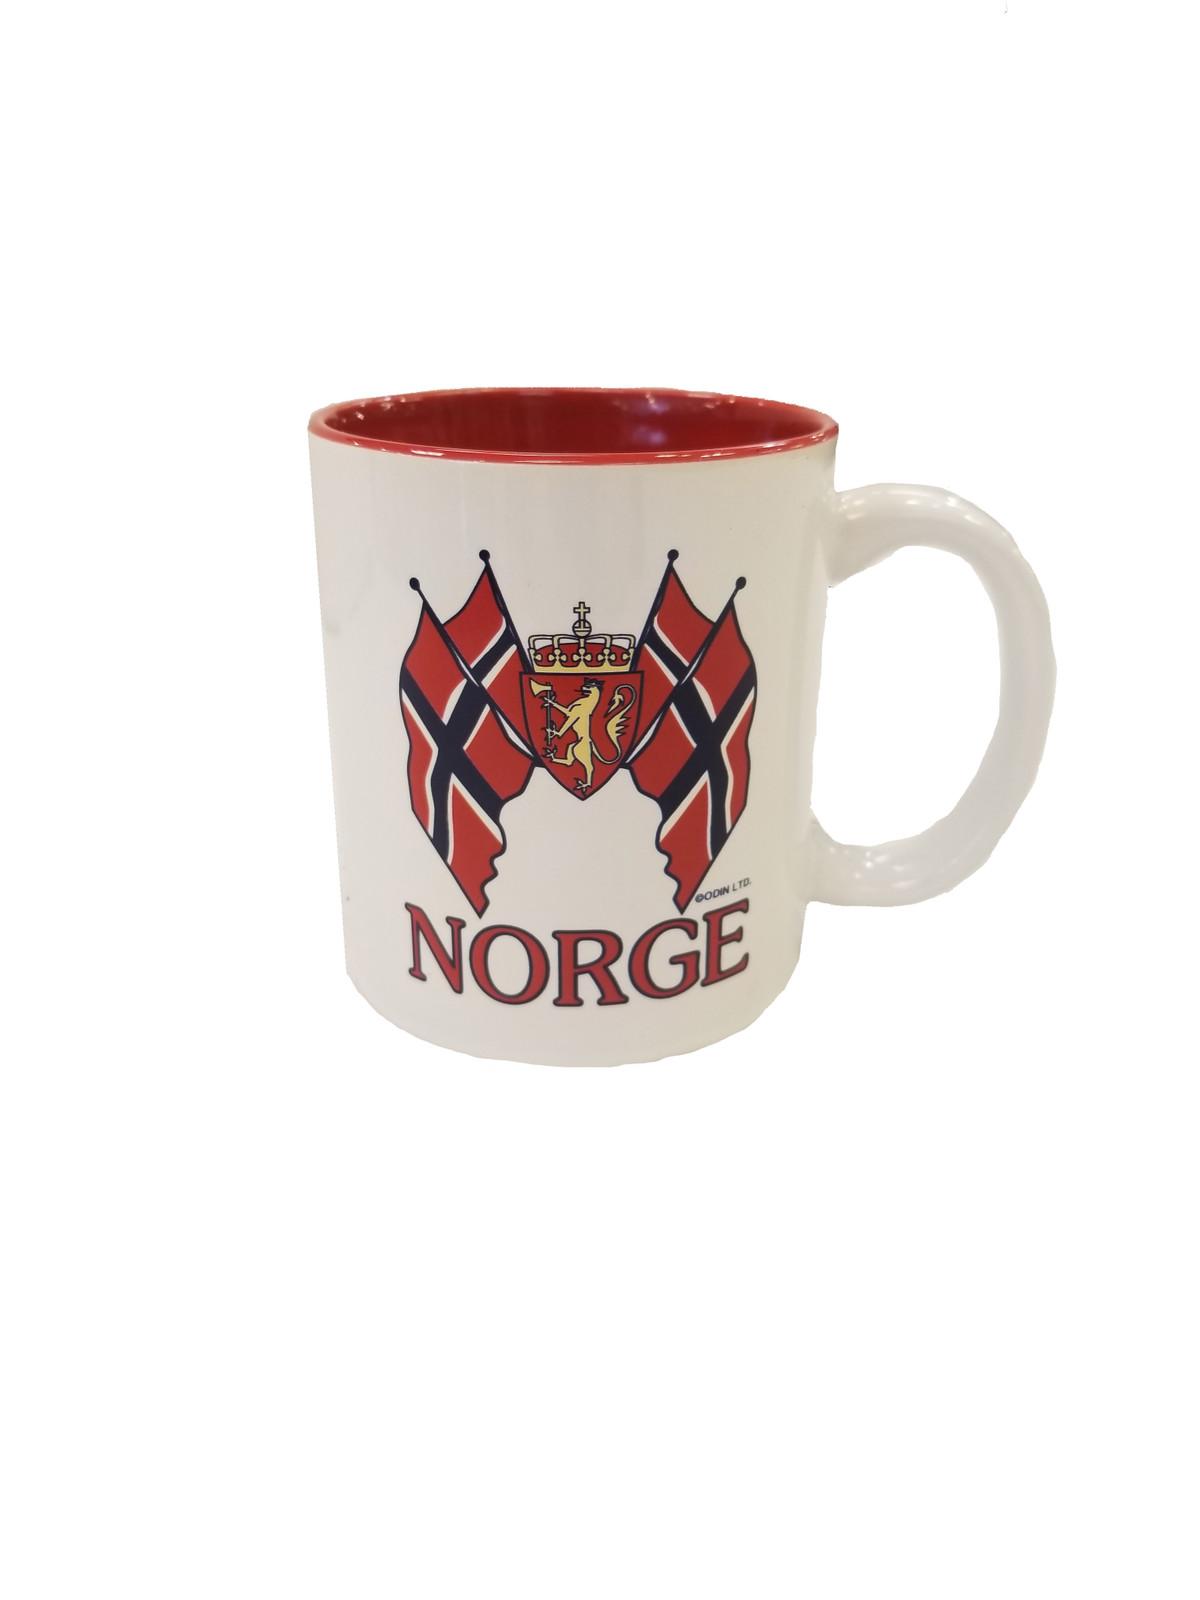 Norwegian Mug - Norge (20190619-04)